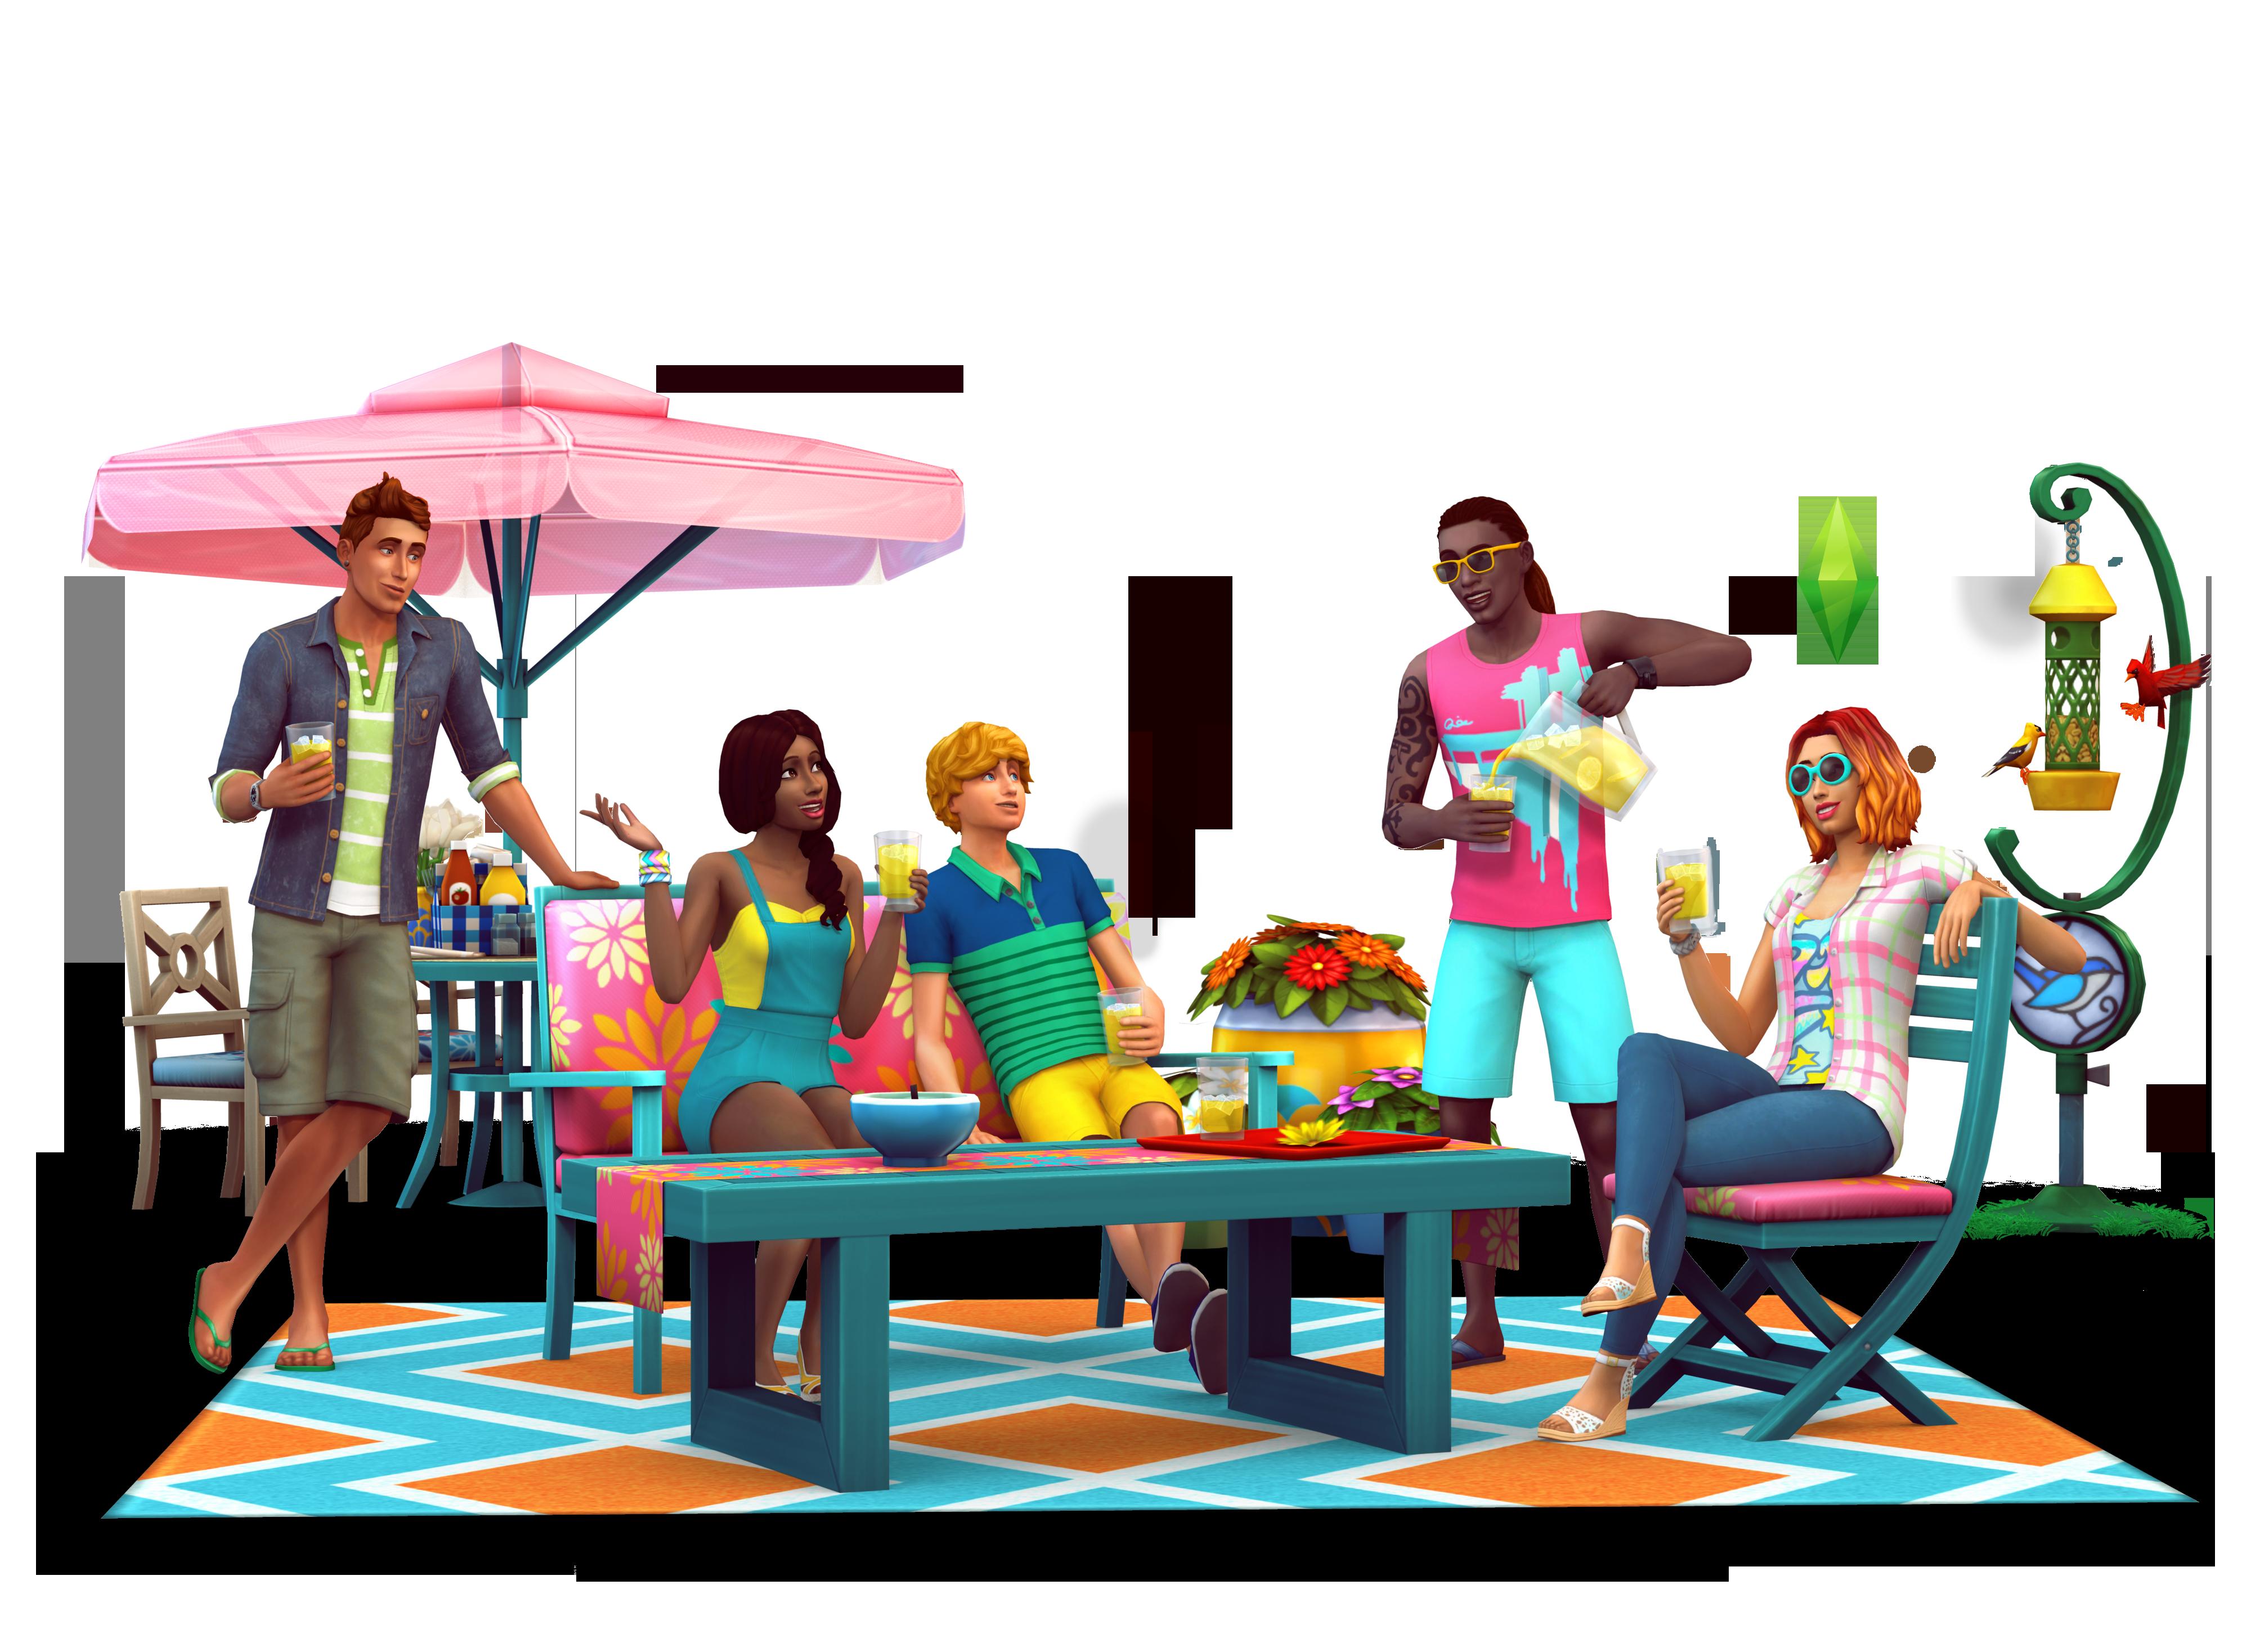 The Sims 4 Backyard Stuff Official Box Art Logo And